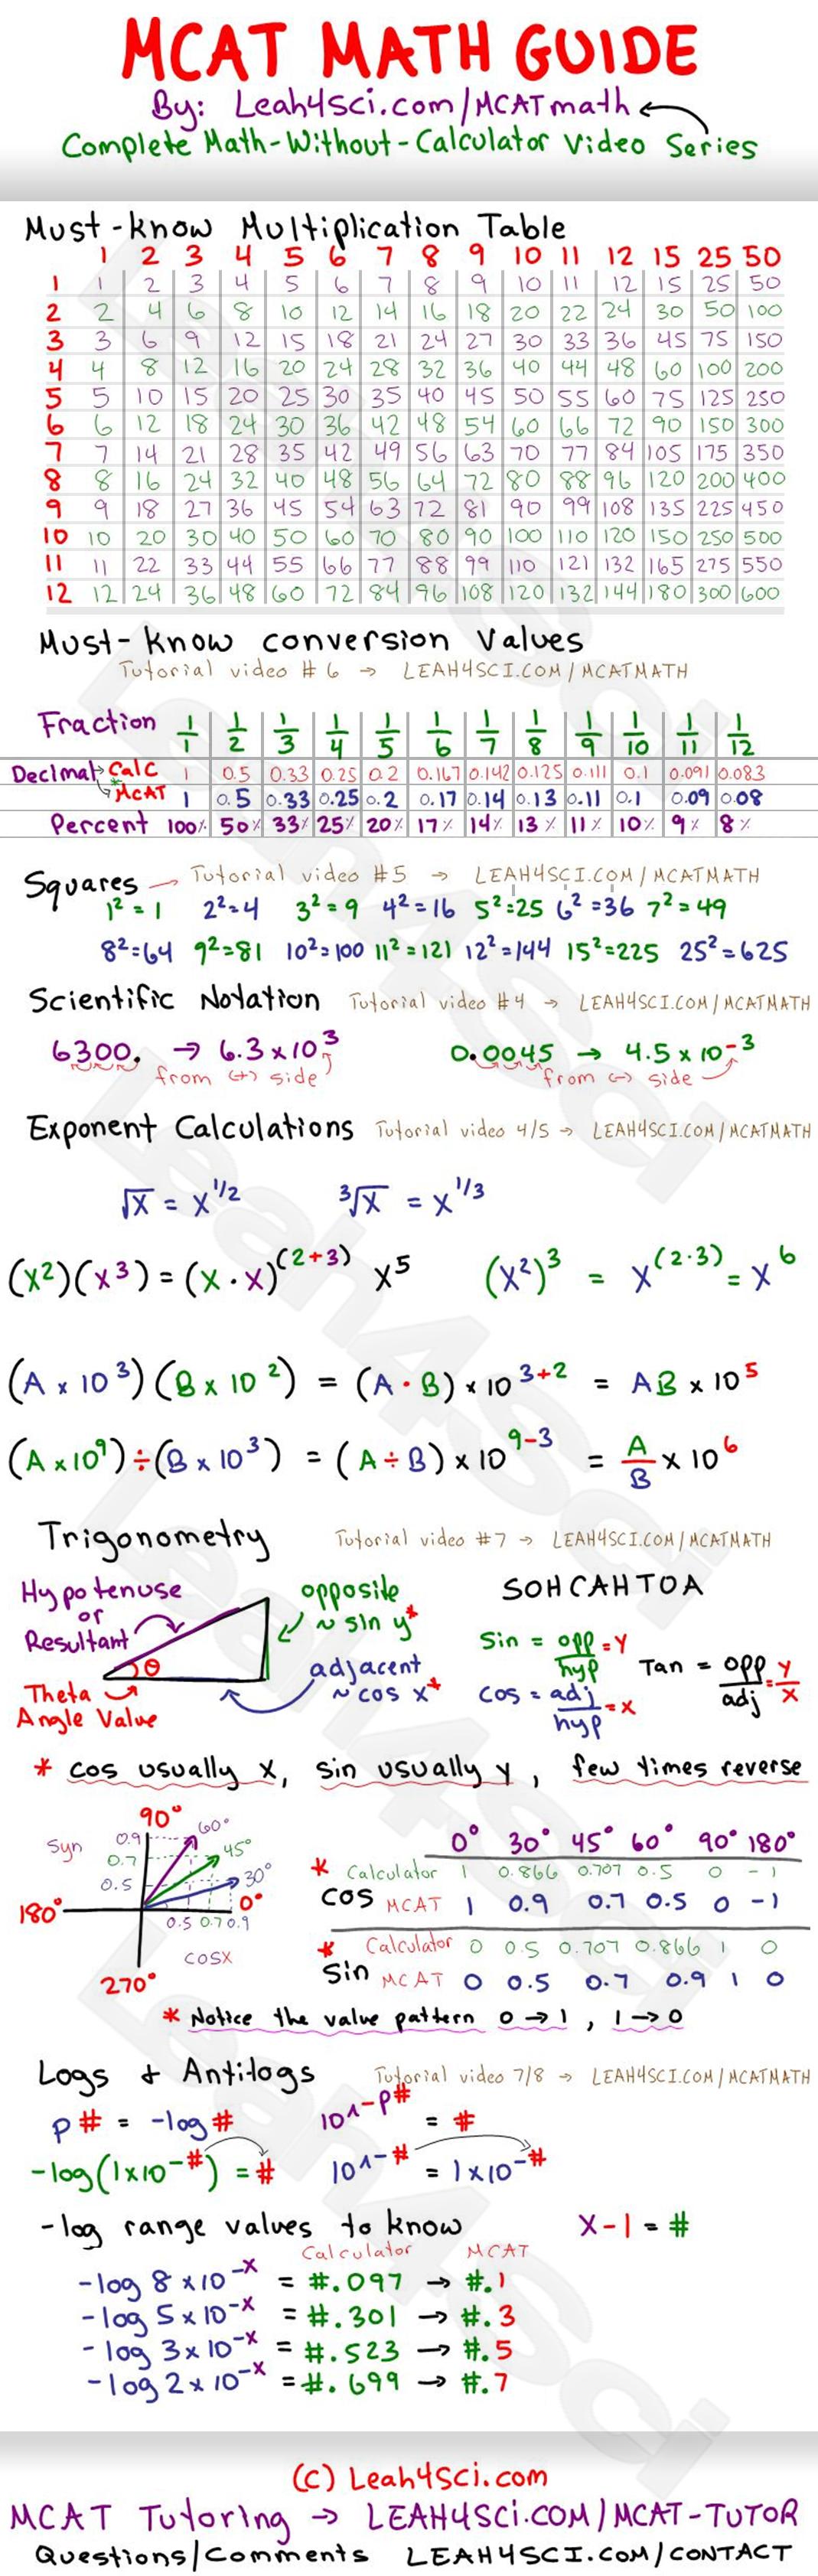 mcat-math-study-guide-cheat-sheet-by-leah4sci